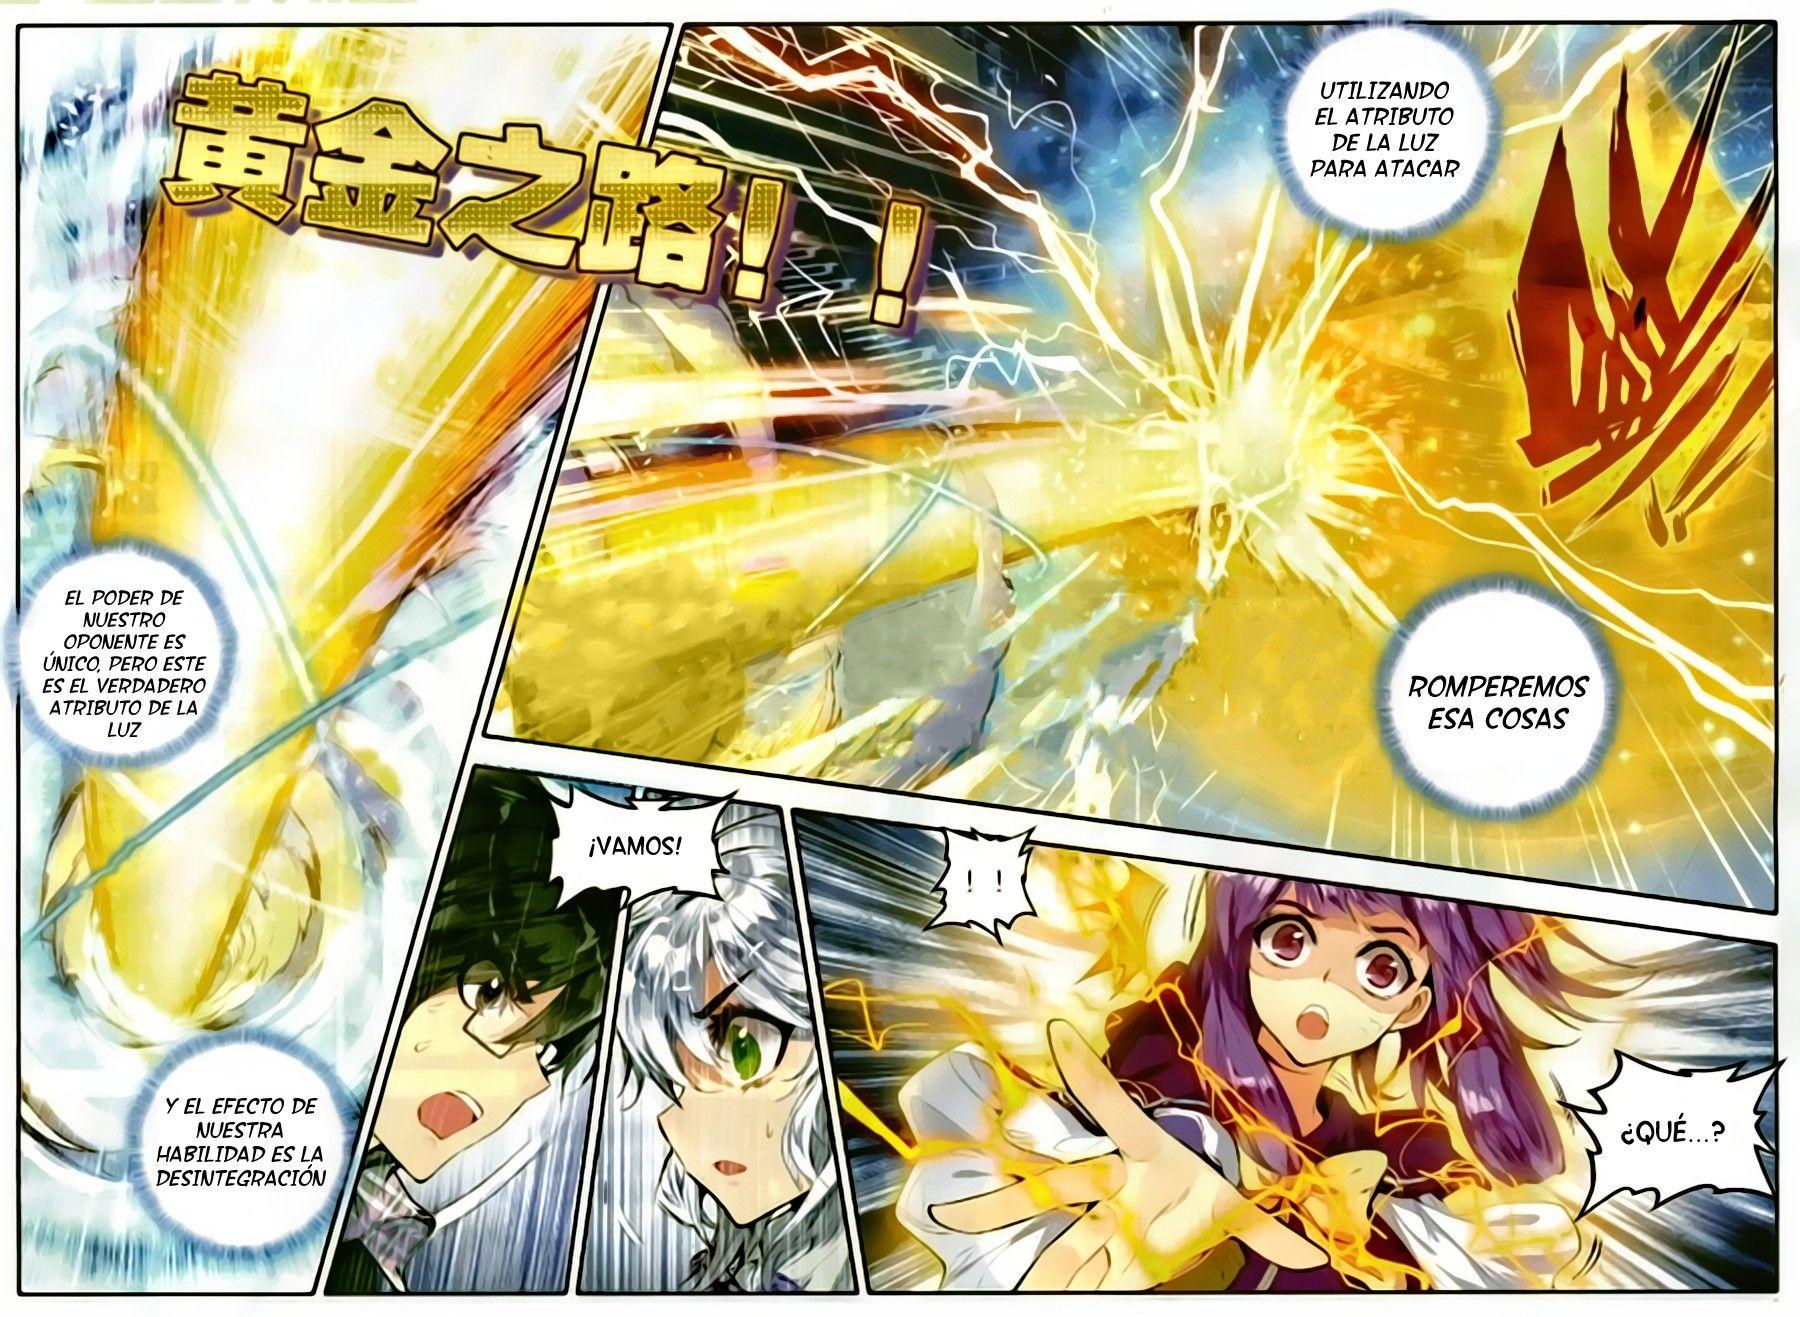 http://c5.ninemanga.com/es_manga/pic2/33/16417/511293/3a932bd942593ecf98d6187897e98d70.jpg Page 6